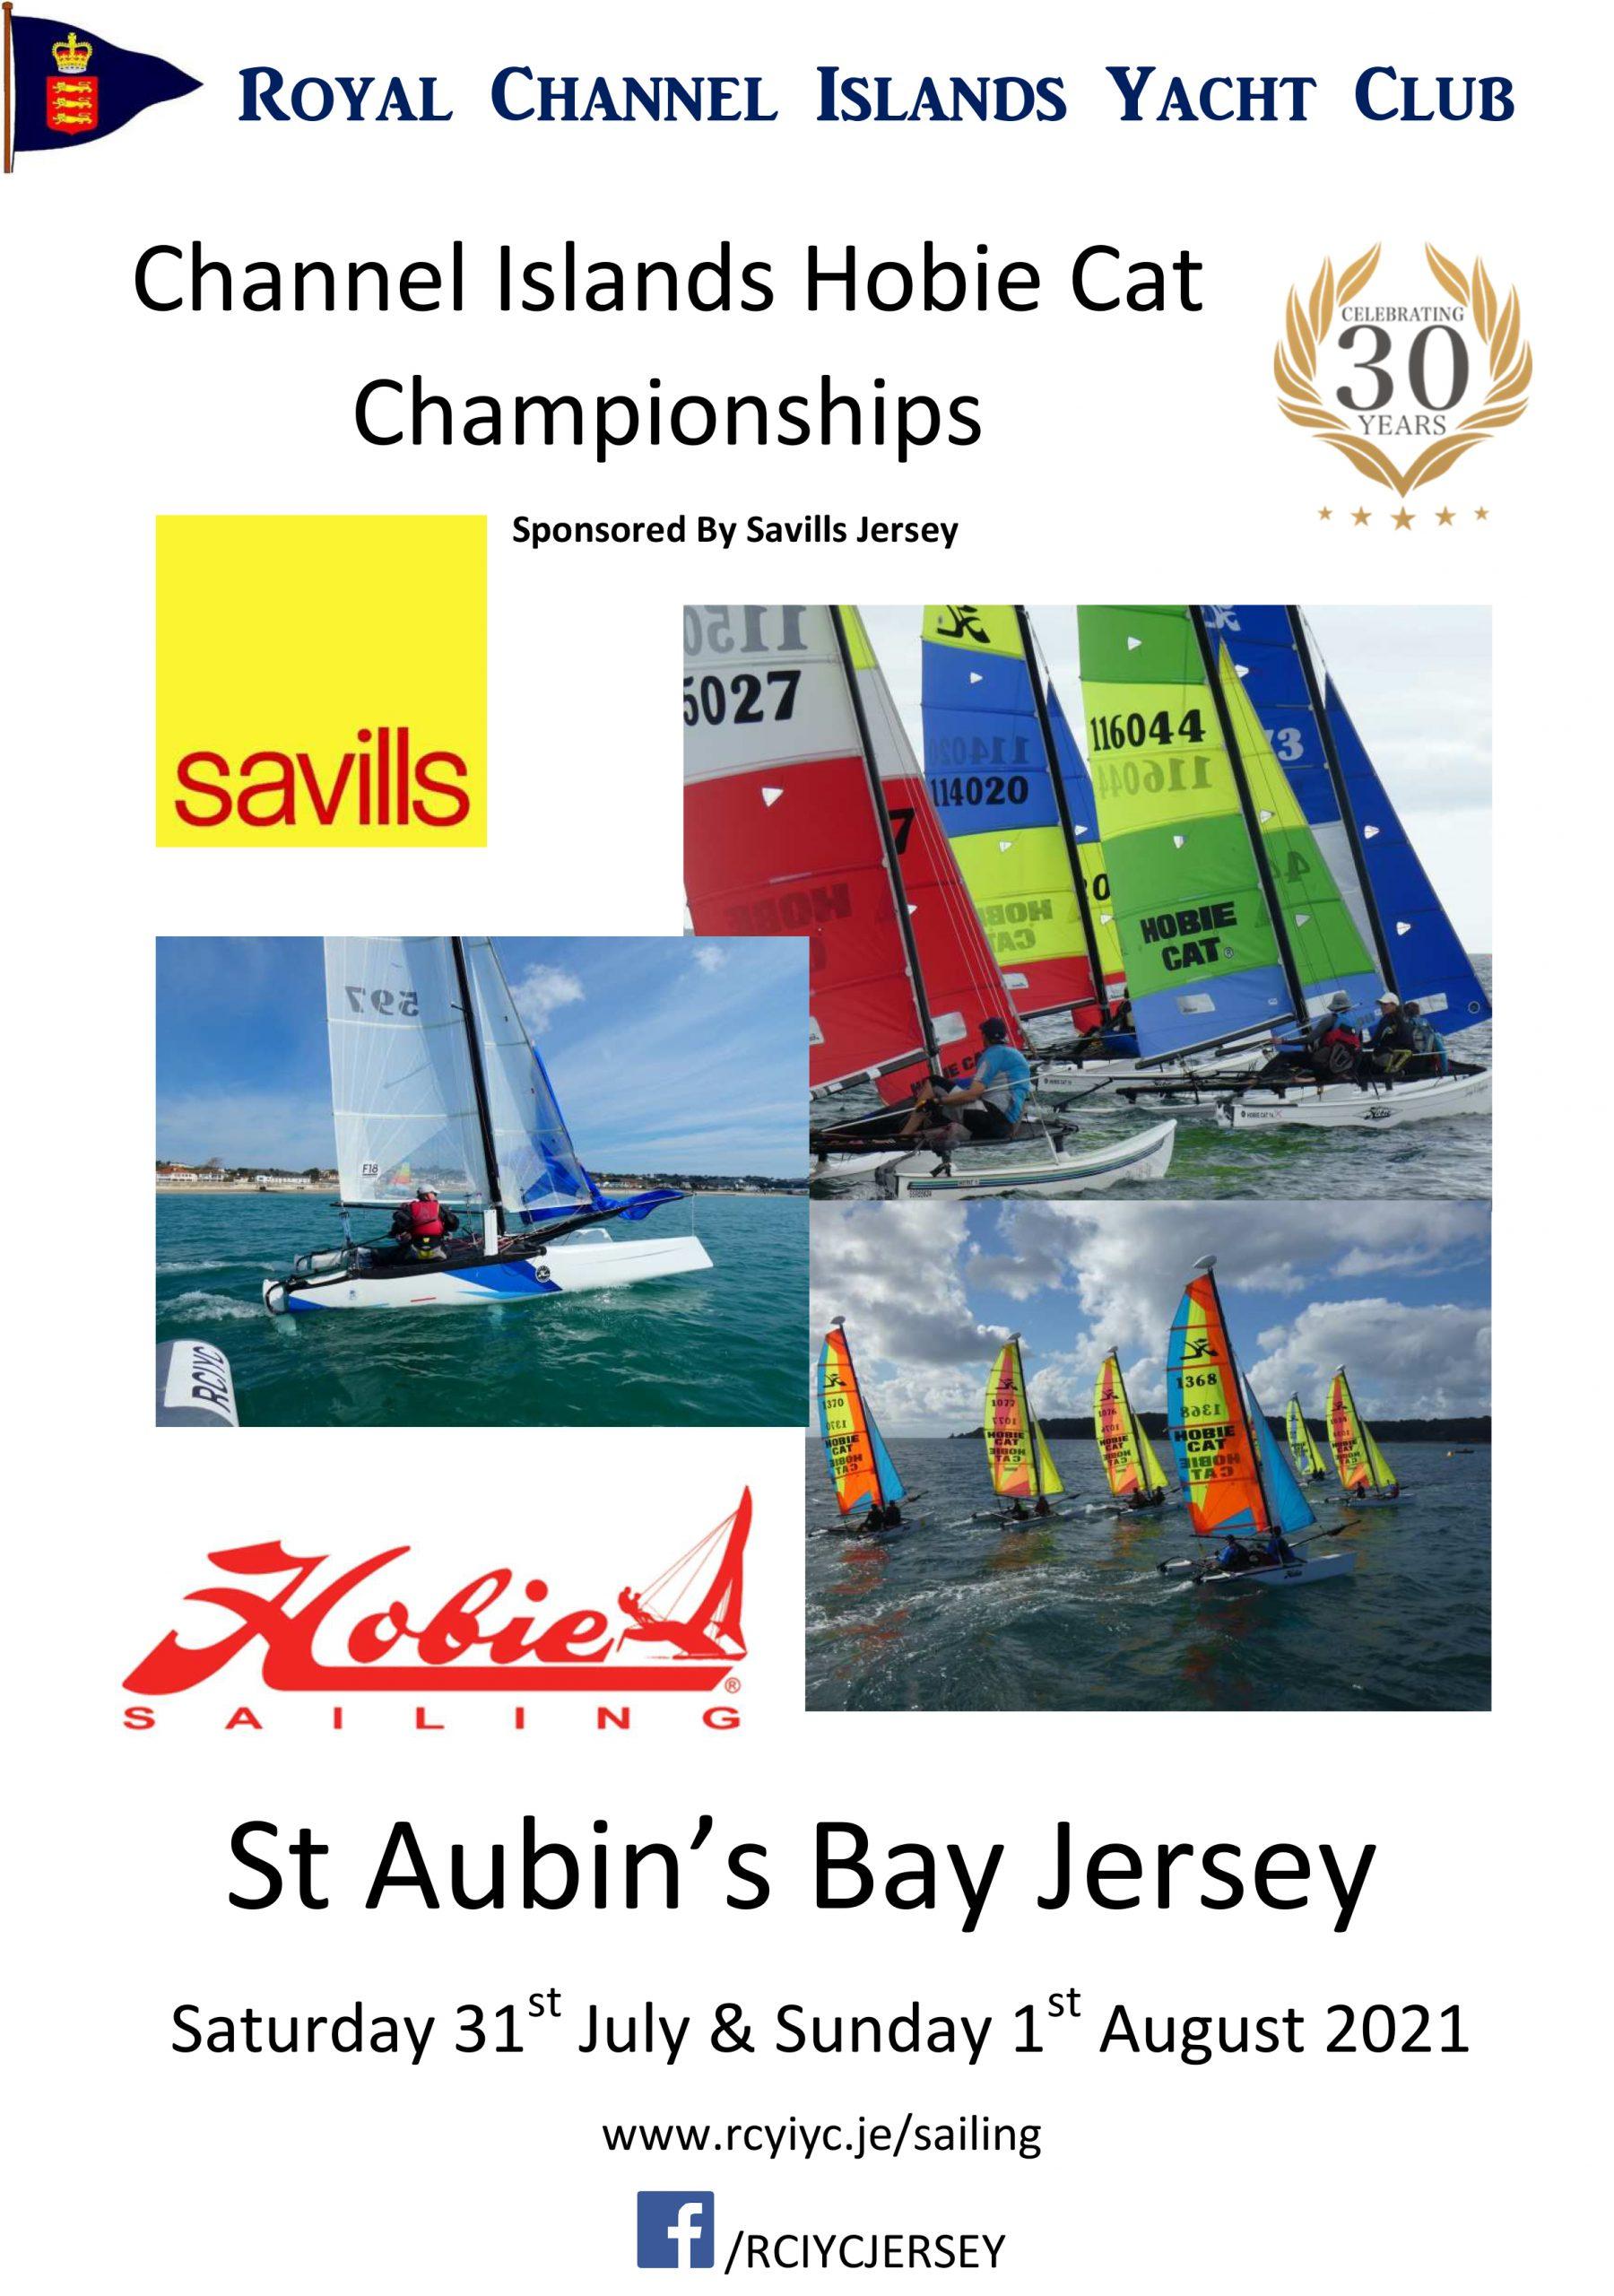 Channel Islands Hobie Cat Championships